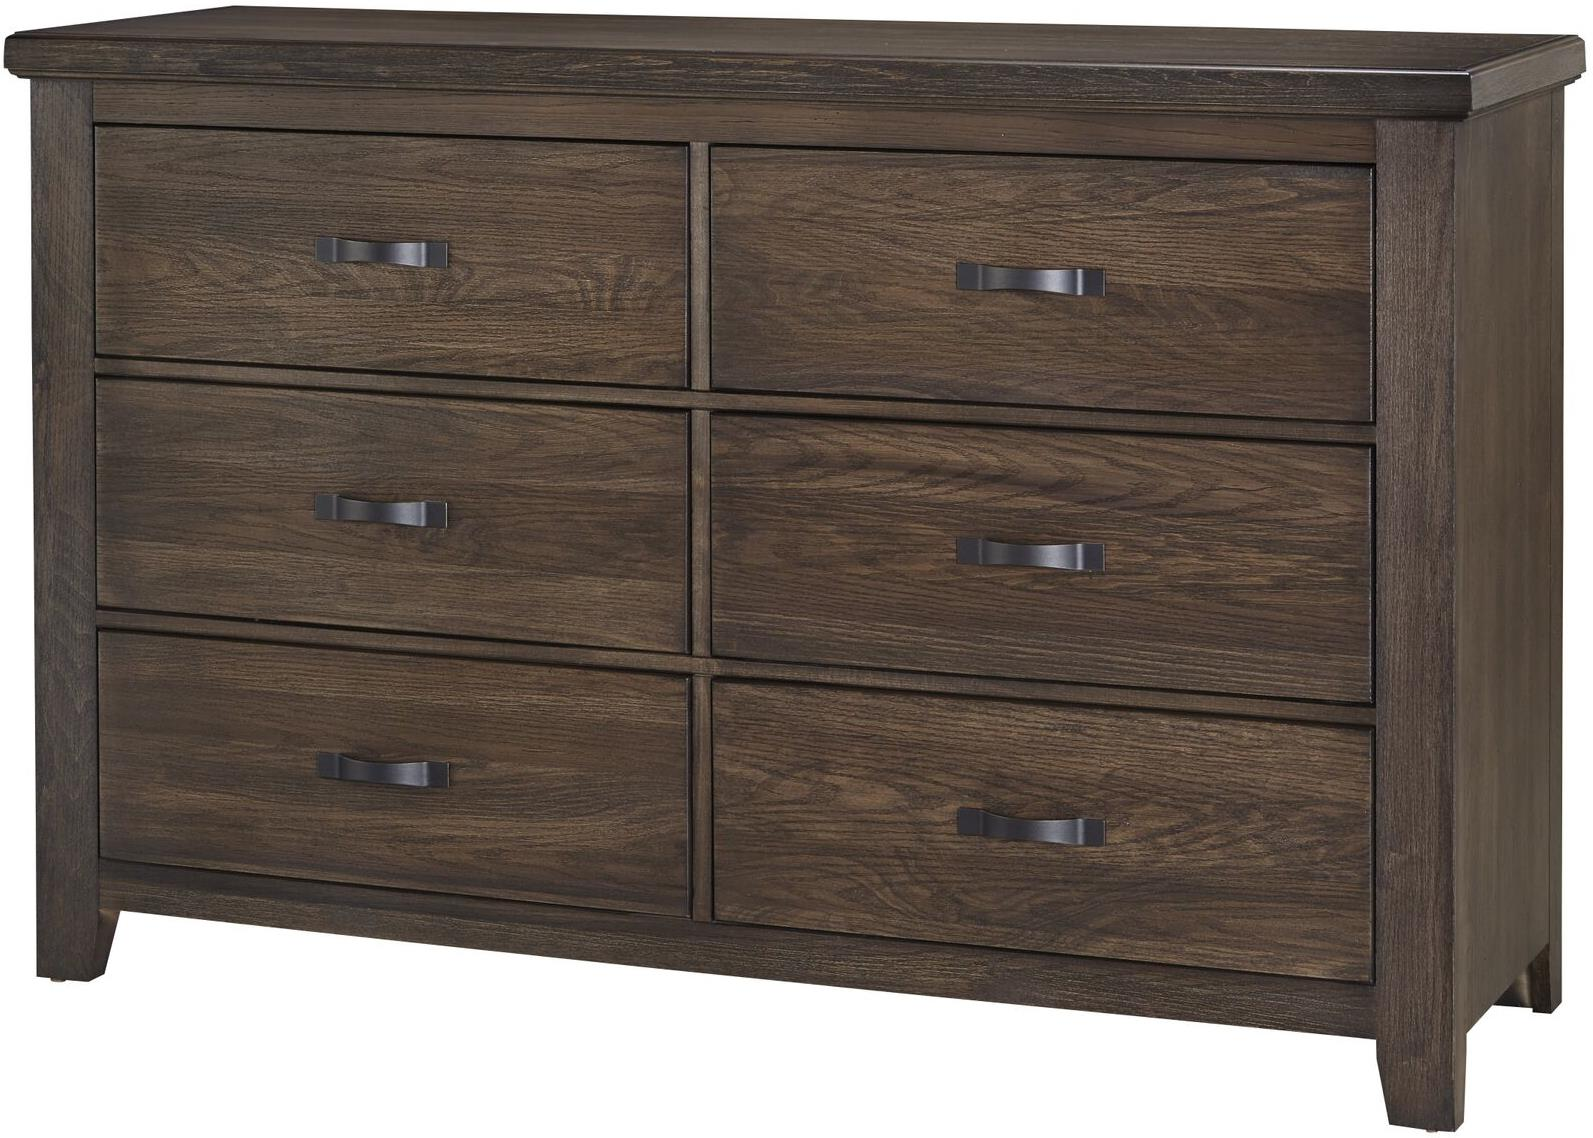 Vaughan Bassett Cassell Park Storage Dresser-6 Drawer - Item Number: 518-002